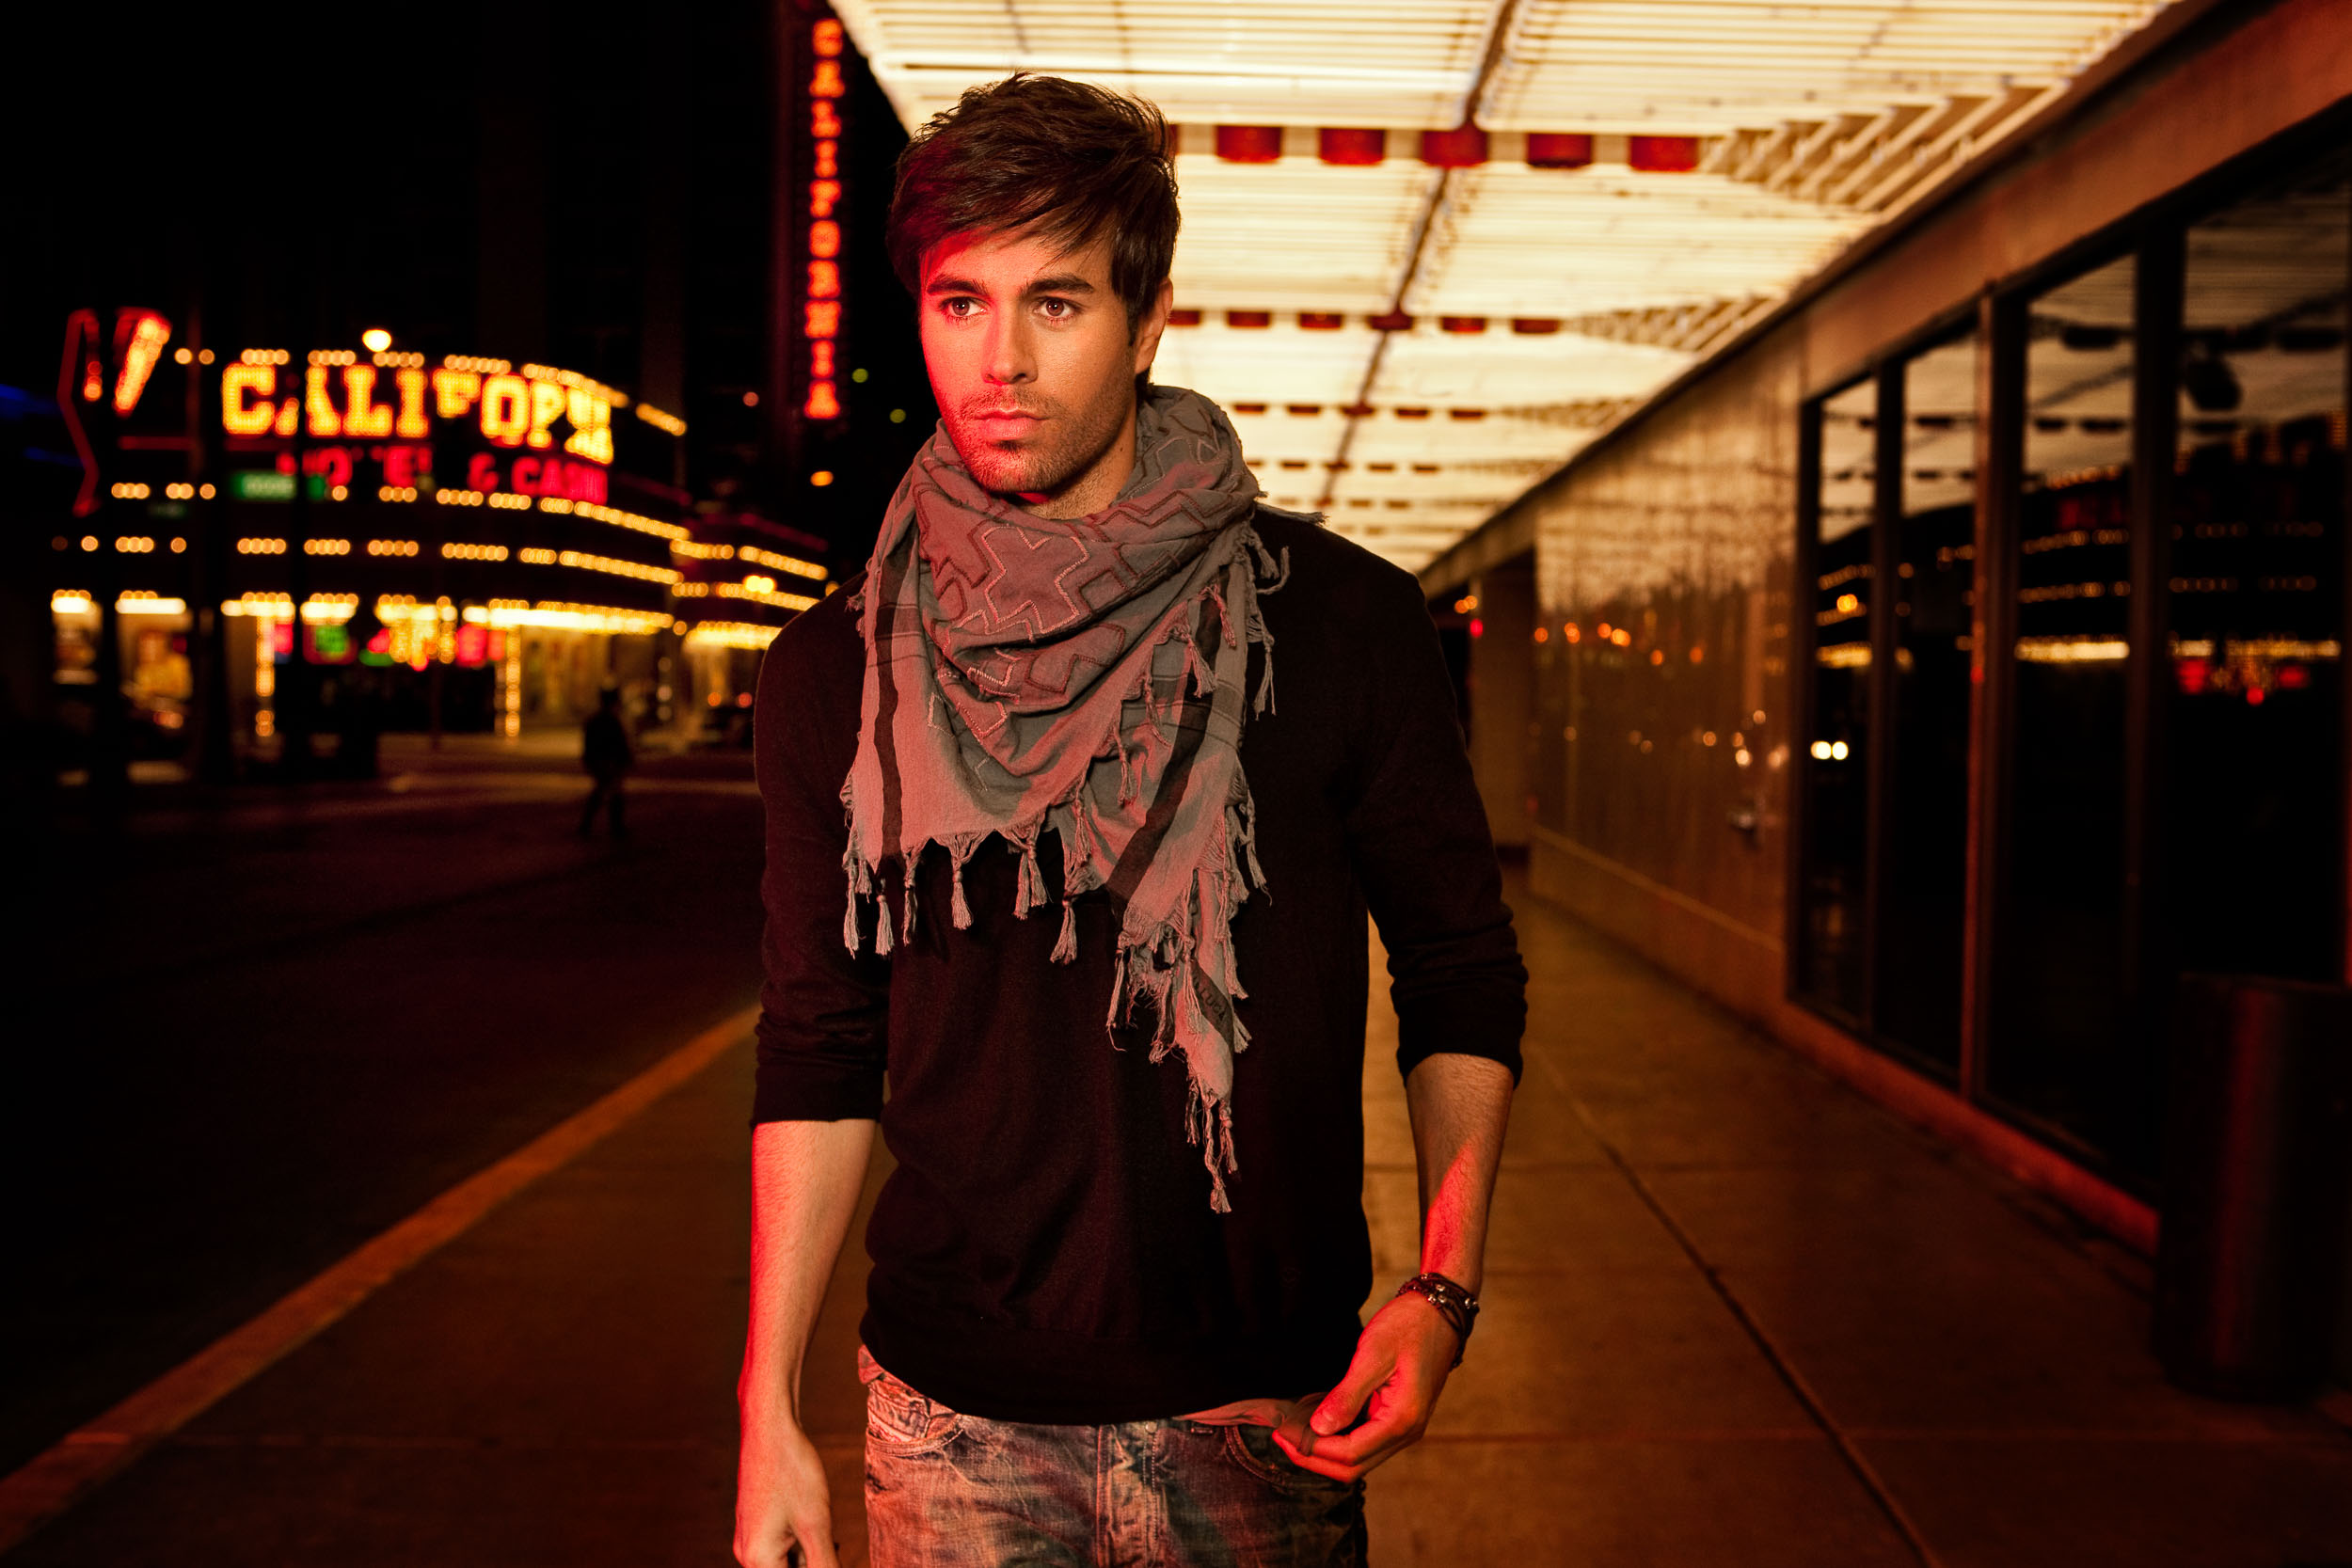 Enrique_Iglesias-Chapman_Baehler22.jpg